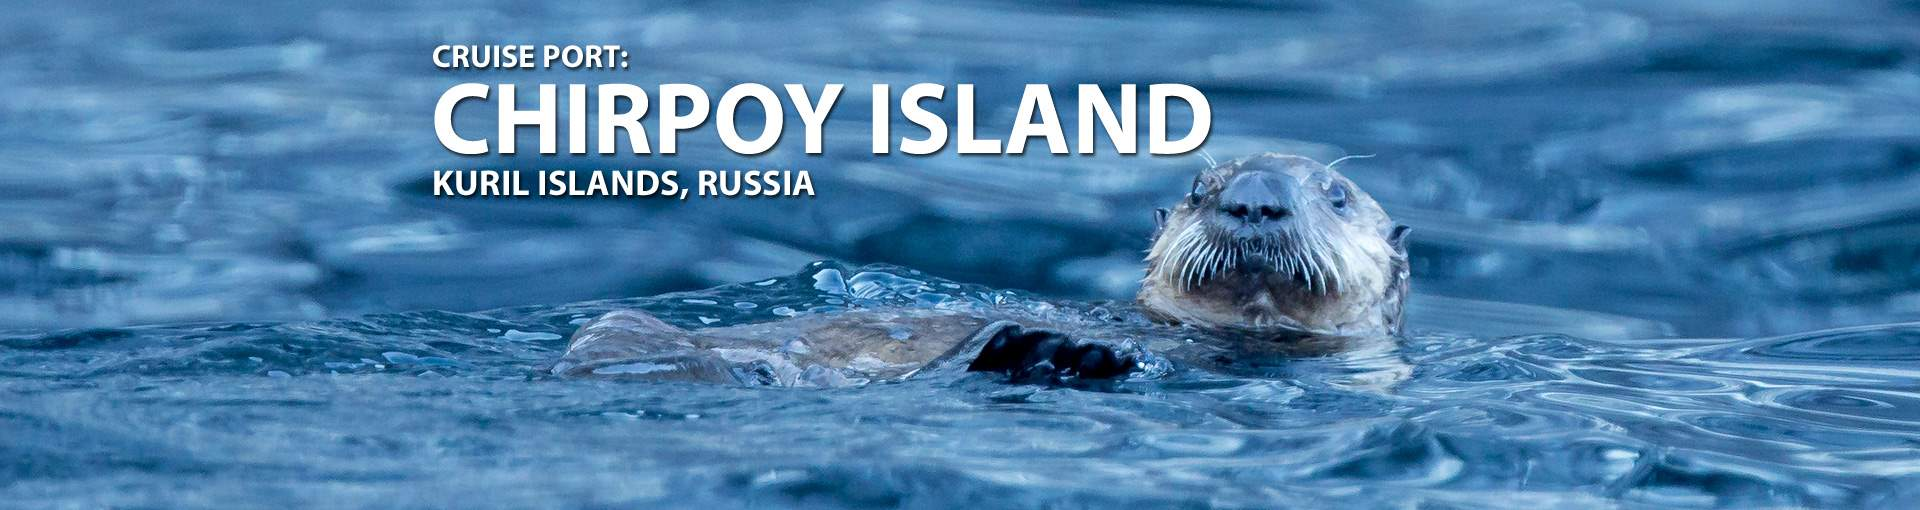 Cruises to Chirpoy Island, Kuril Islands